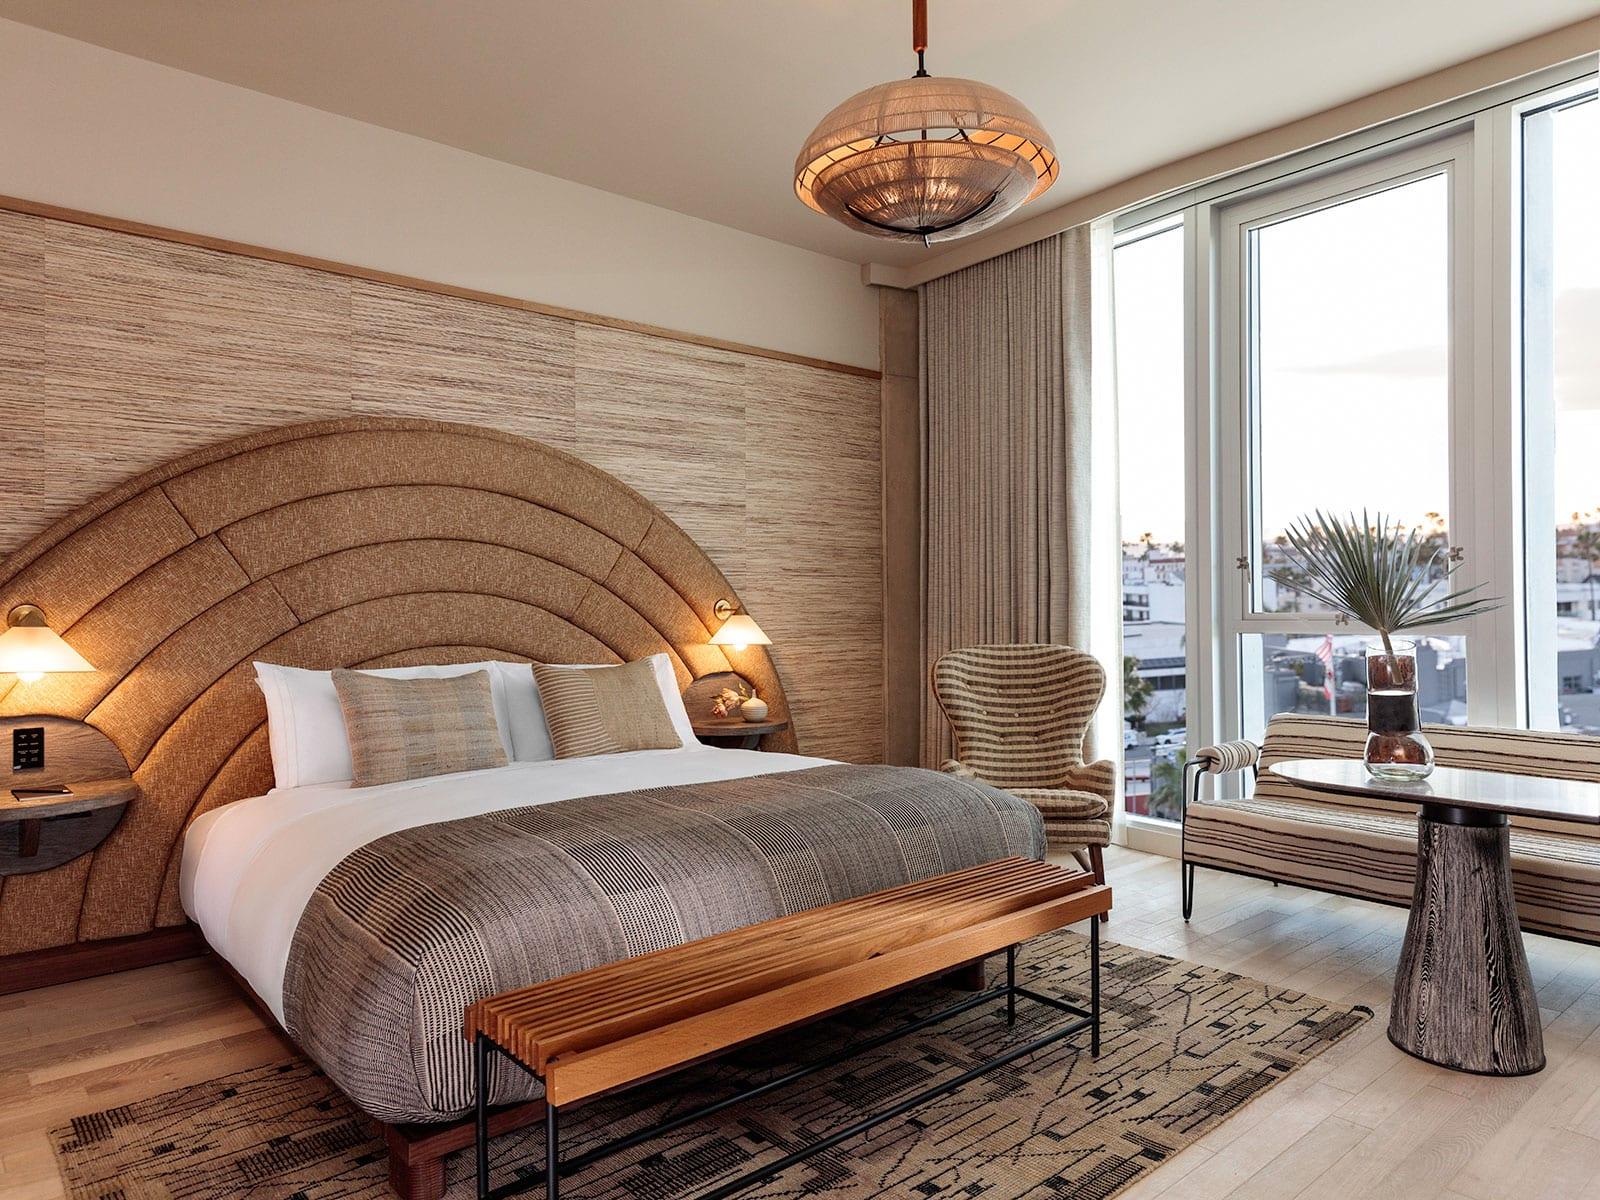 Santa Monica bon hôtel par Kelly Wearstler | wanderlust design coco kelley